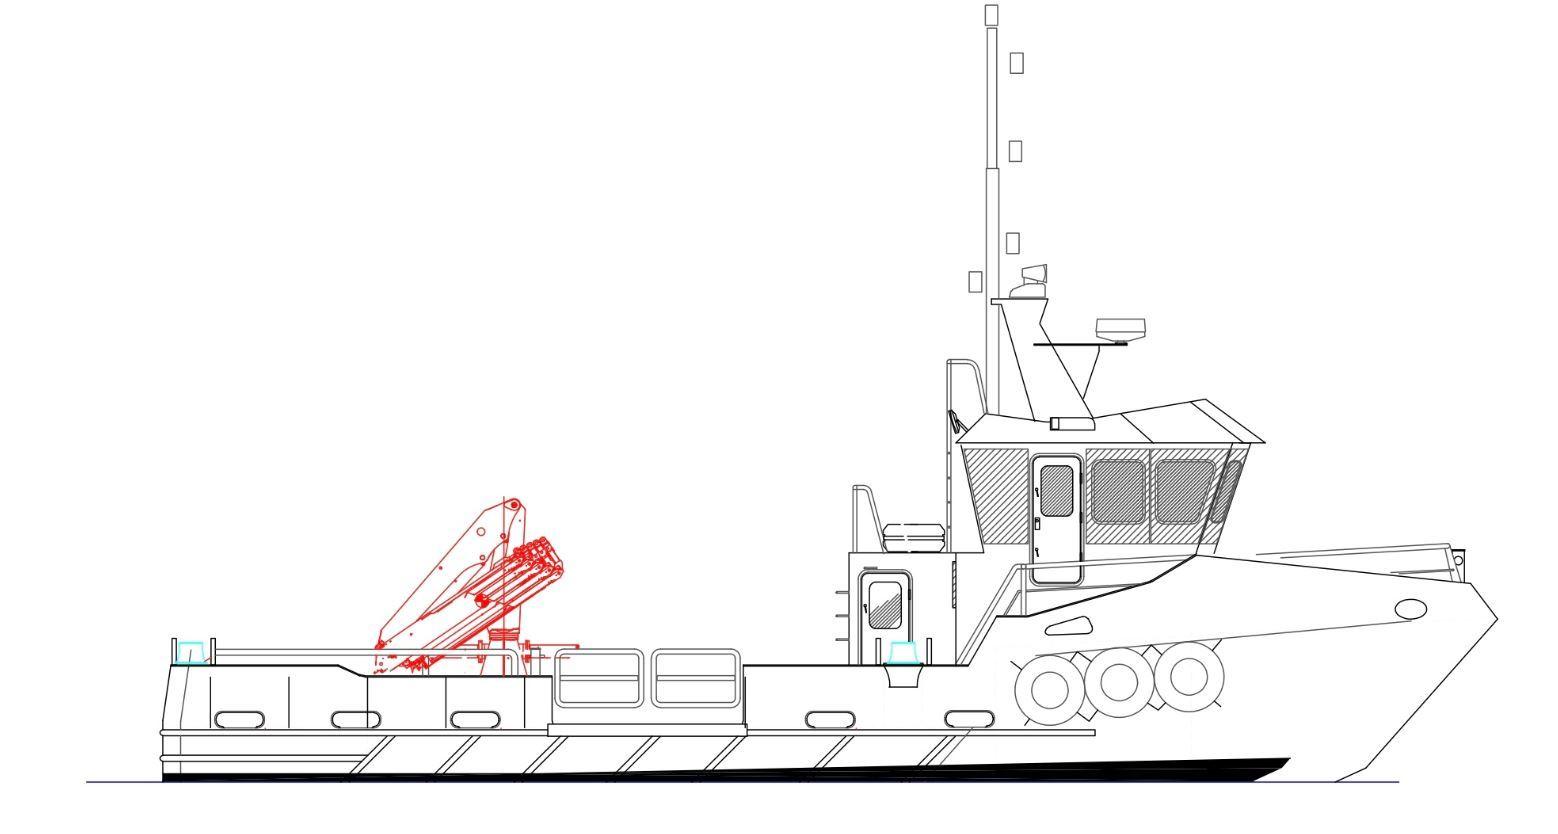 Highlands Built Boat Takes Shape For Scottish Sea Farms